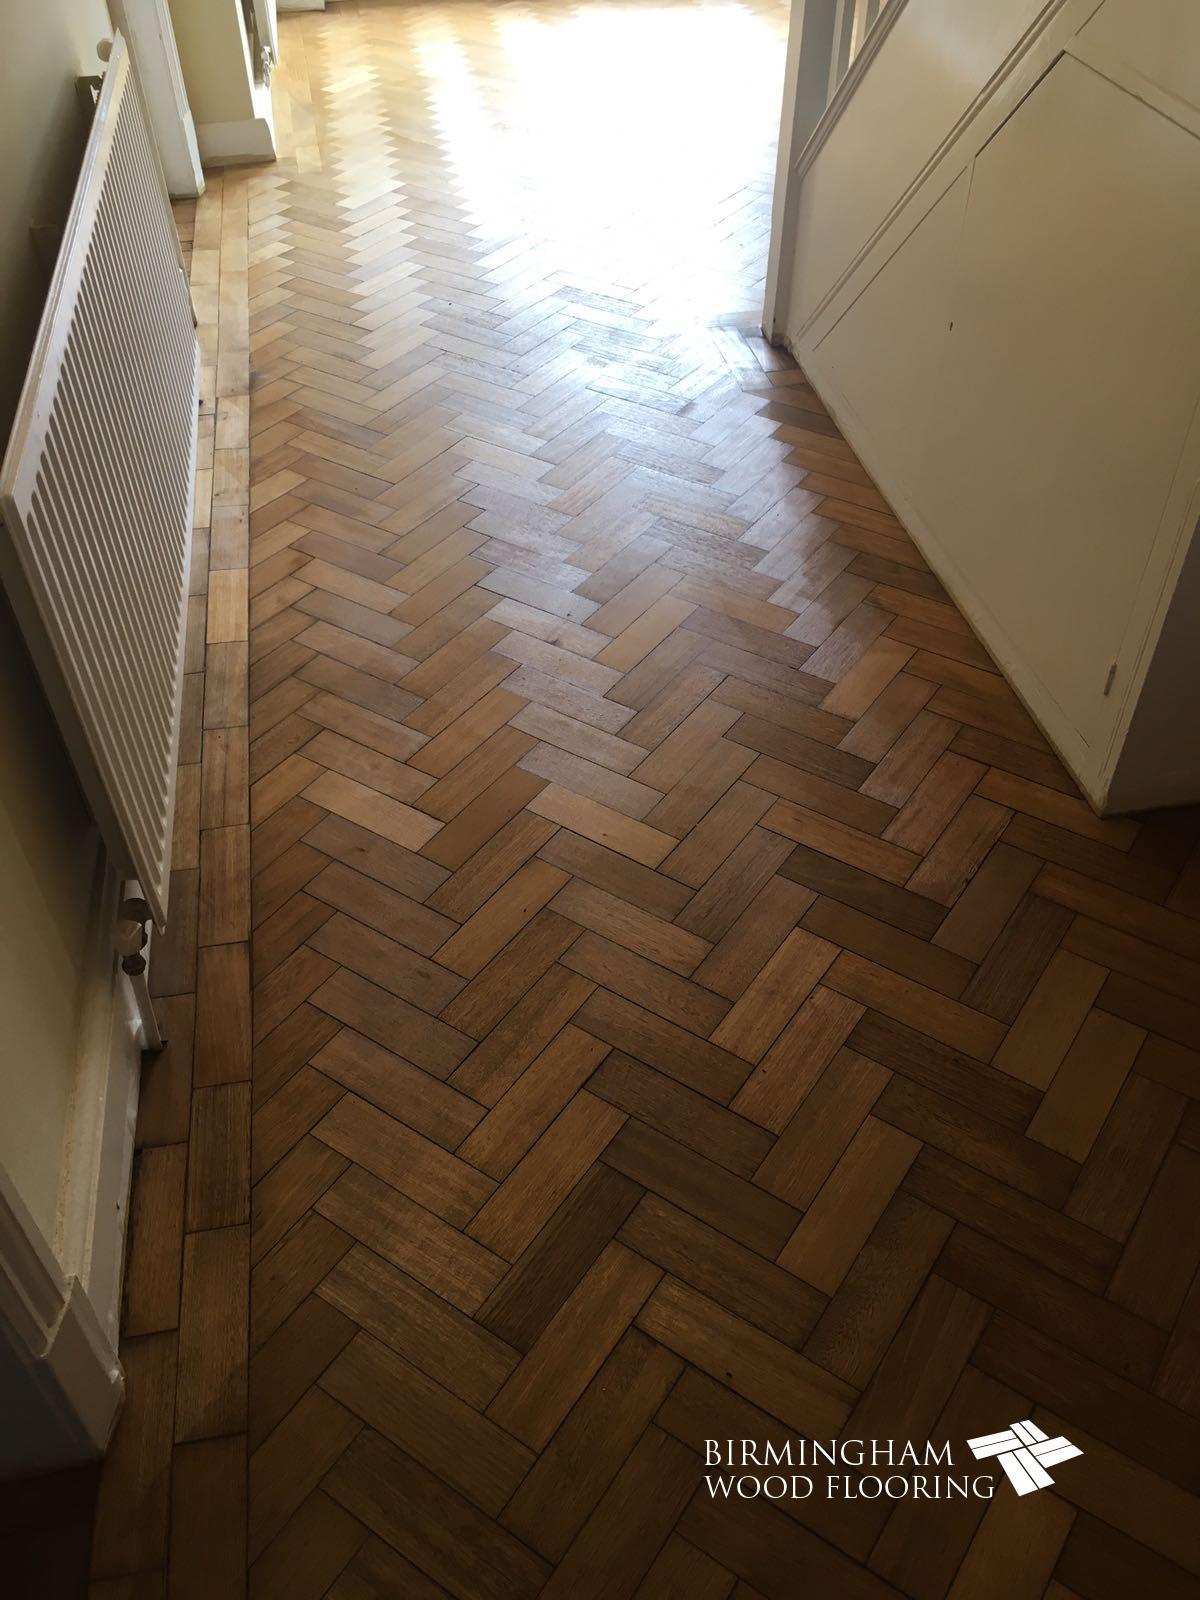 Oak-floor-sanding-sealing-with-Bona-Mega-Medium-Oak-stain-2